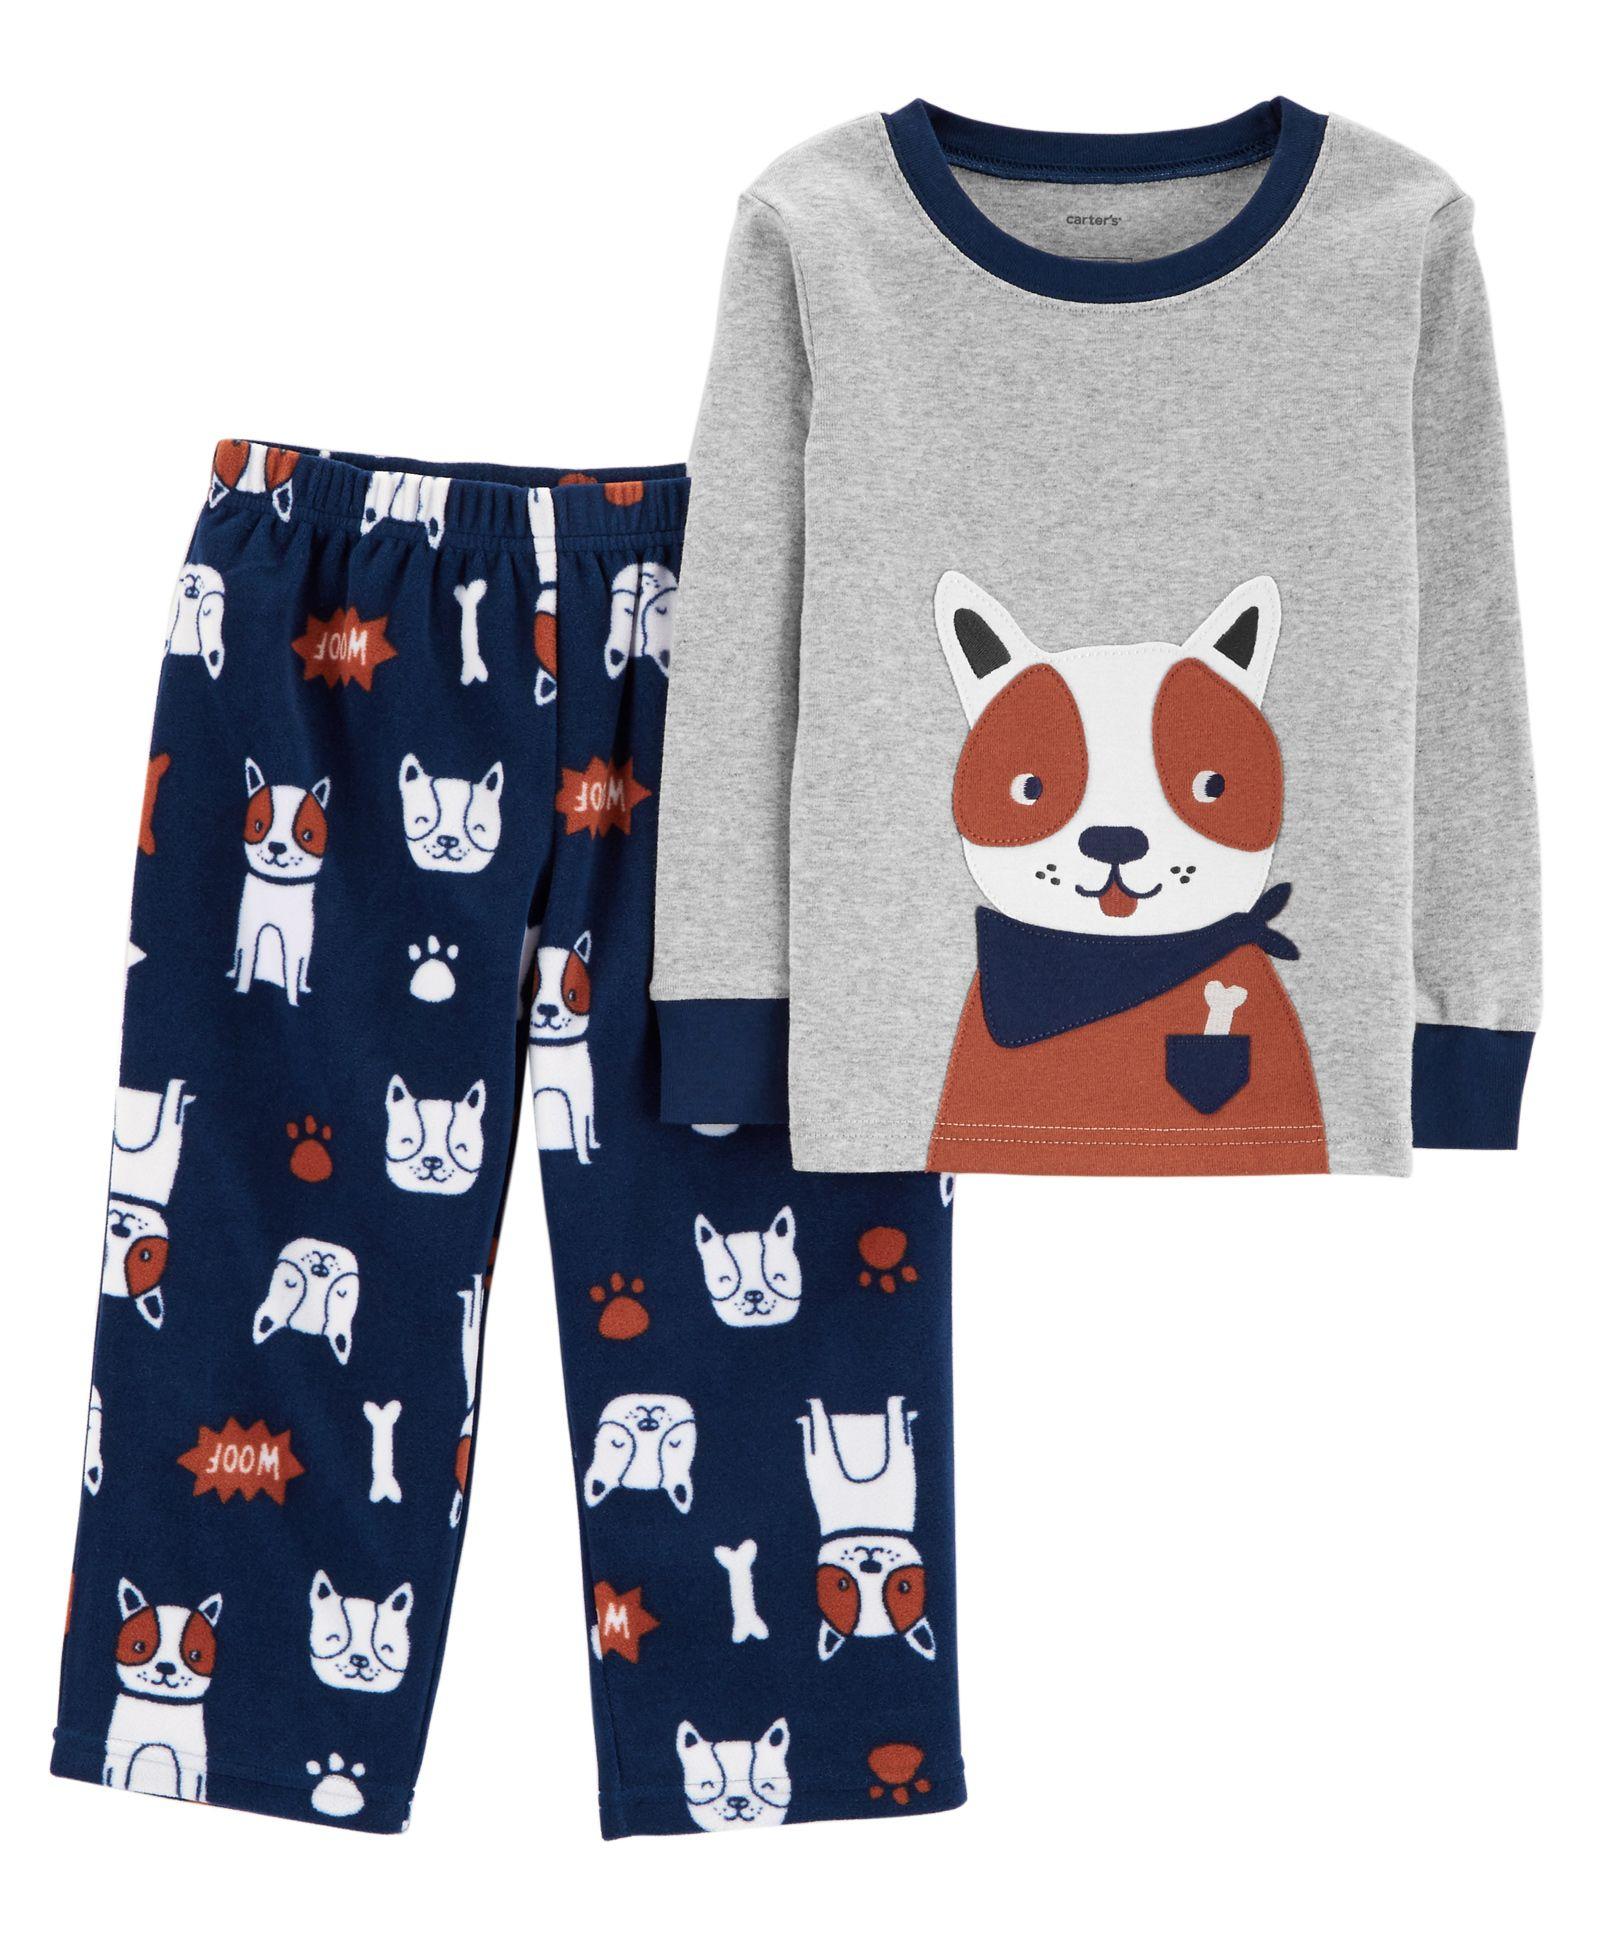 0dc56e80bed8 Carter s 2-Piece Dog Snug Fit Cotton   Fleece PJs - Grey Blue